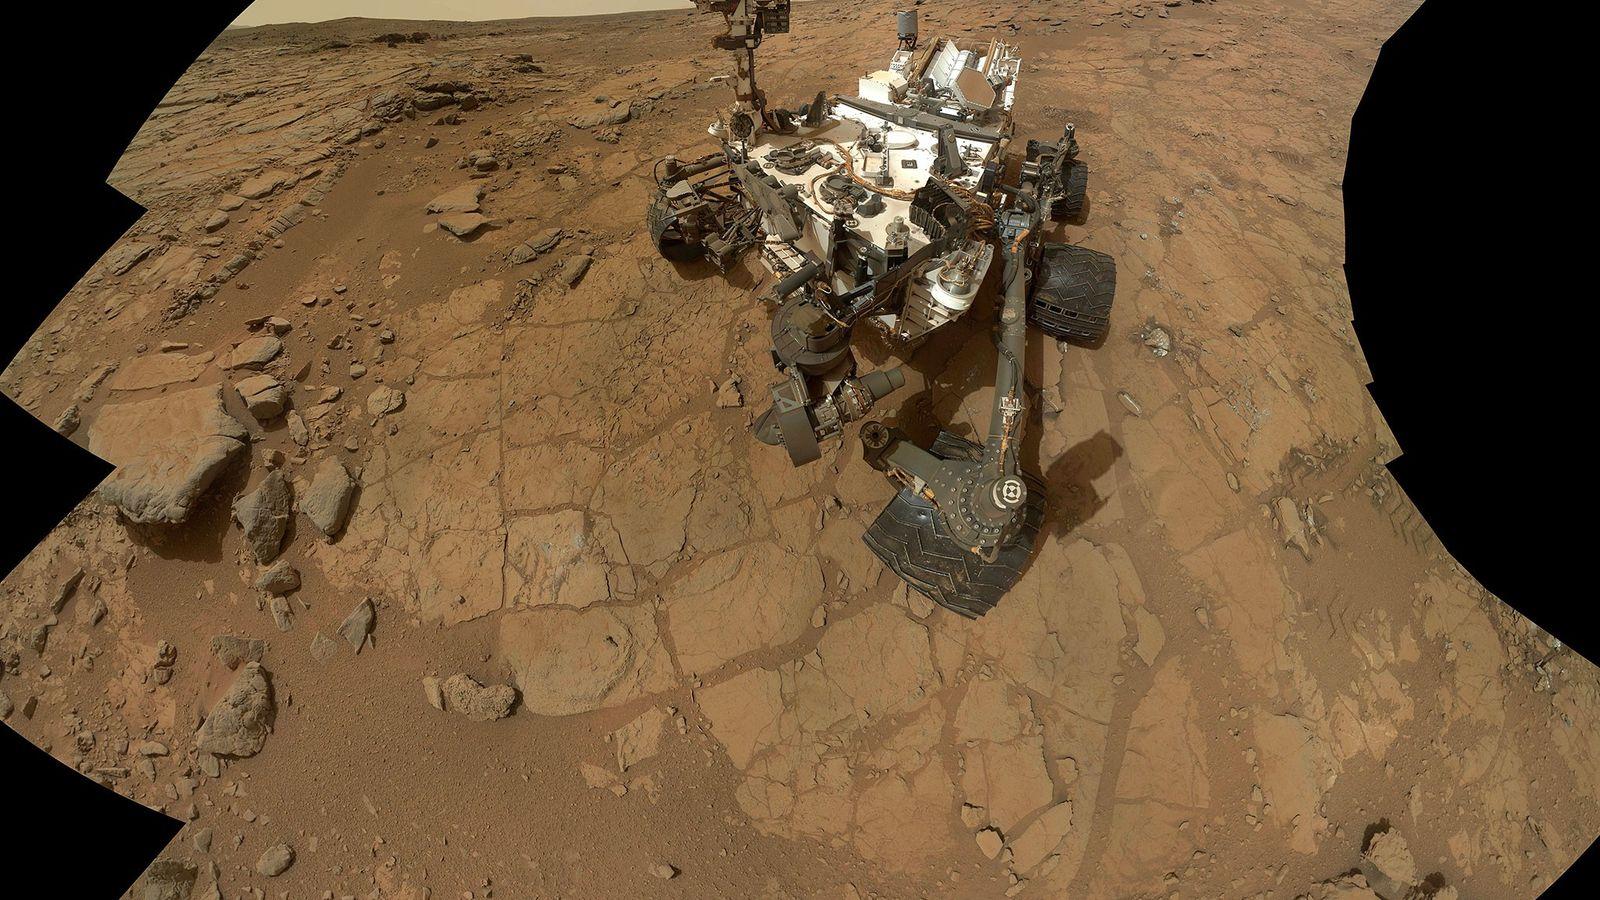 A self-portrait of the Mars rover Curiosity.